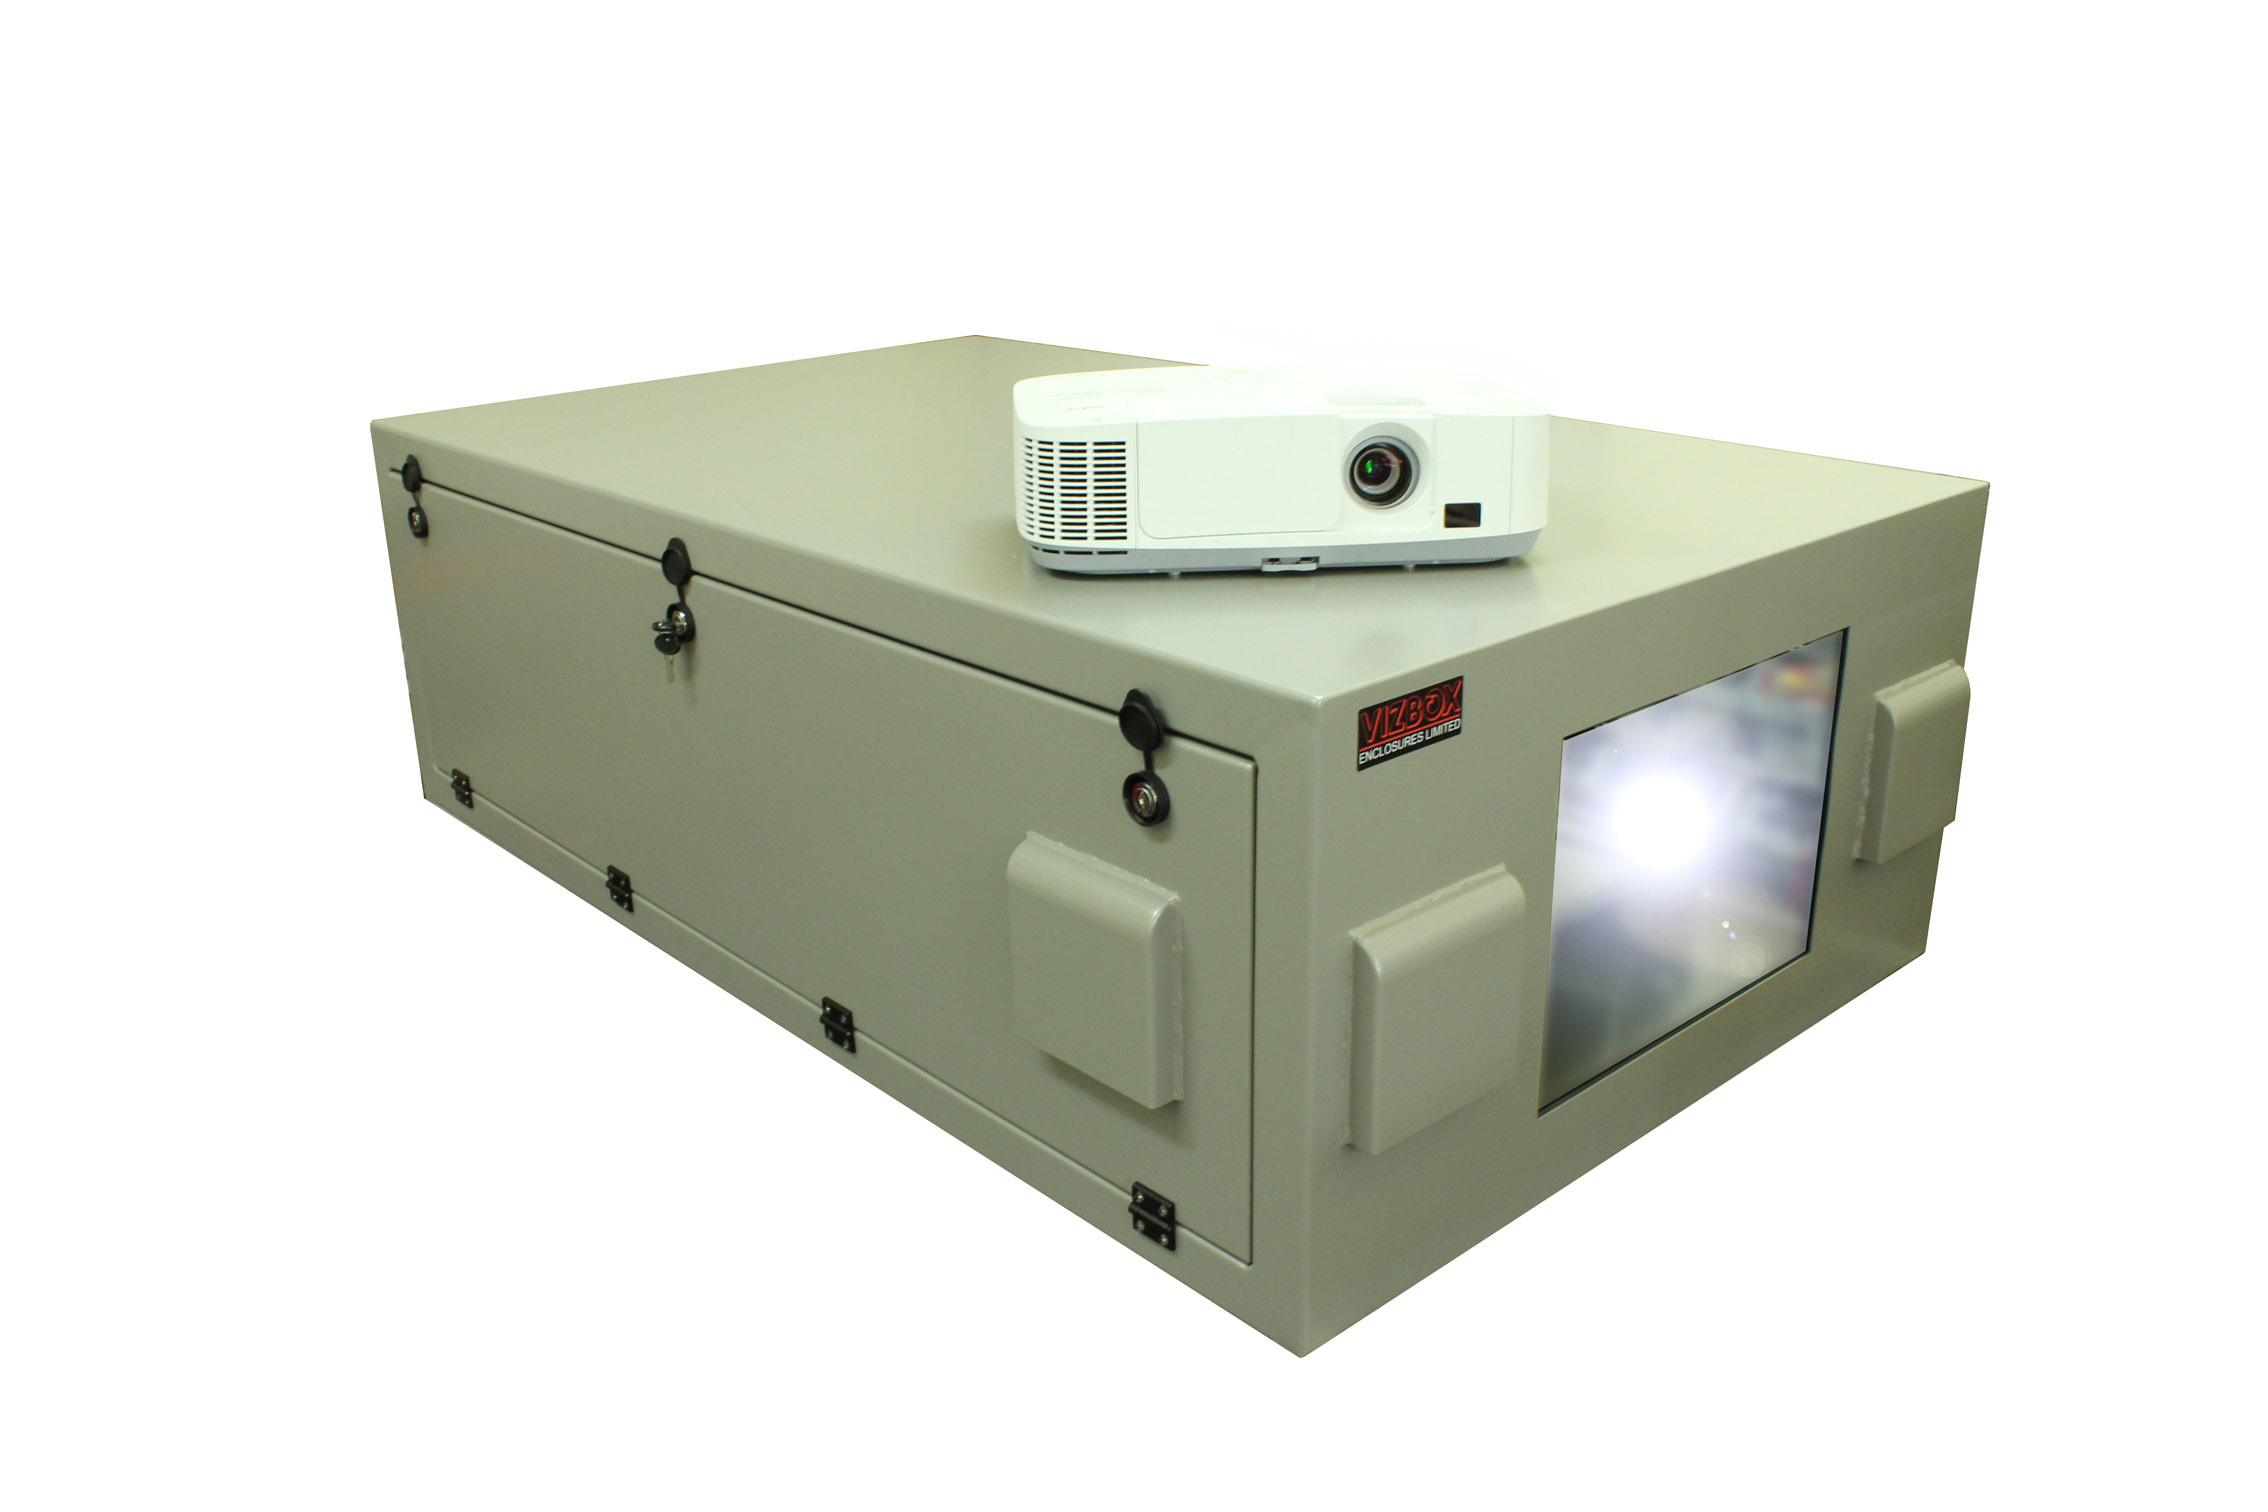 Christie Boxer projector enclosure